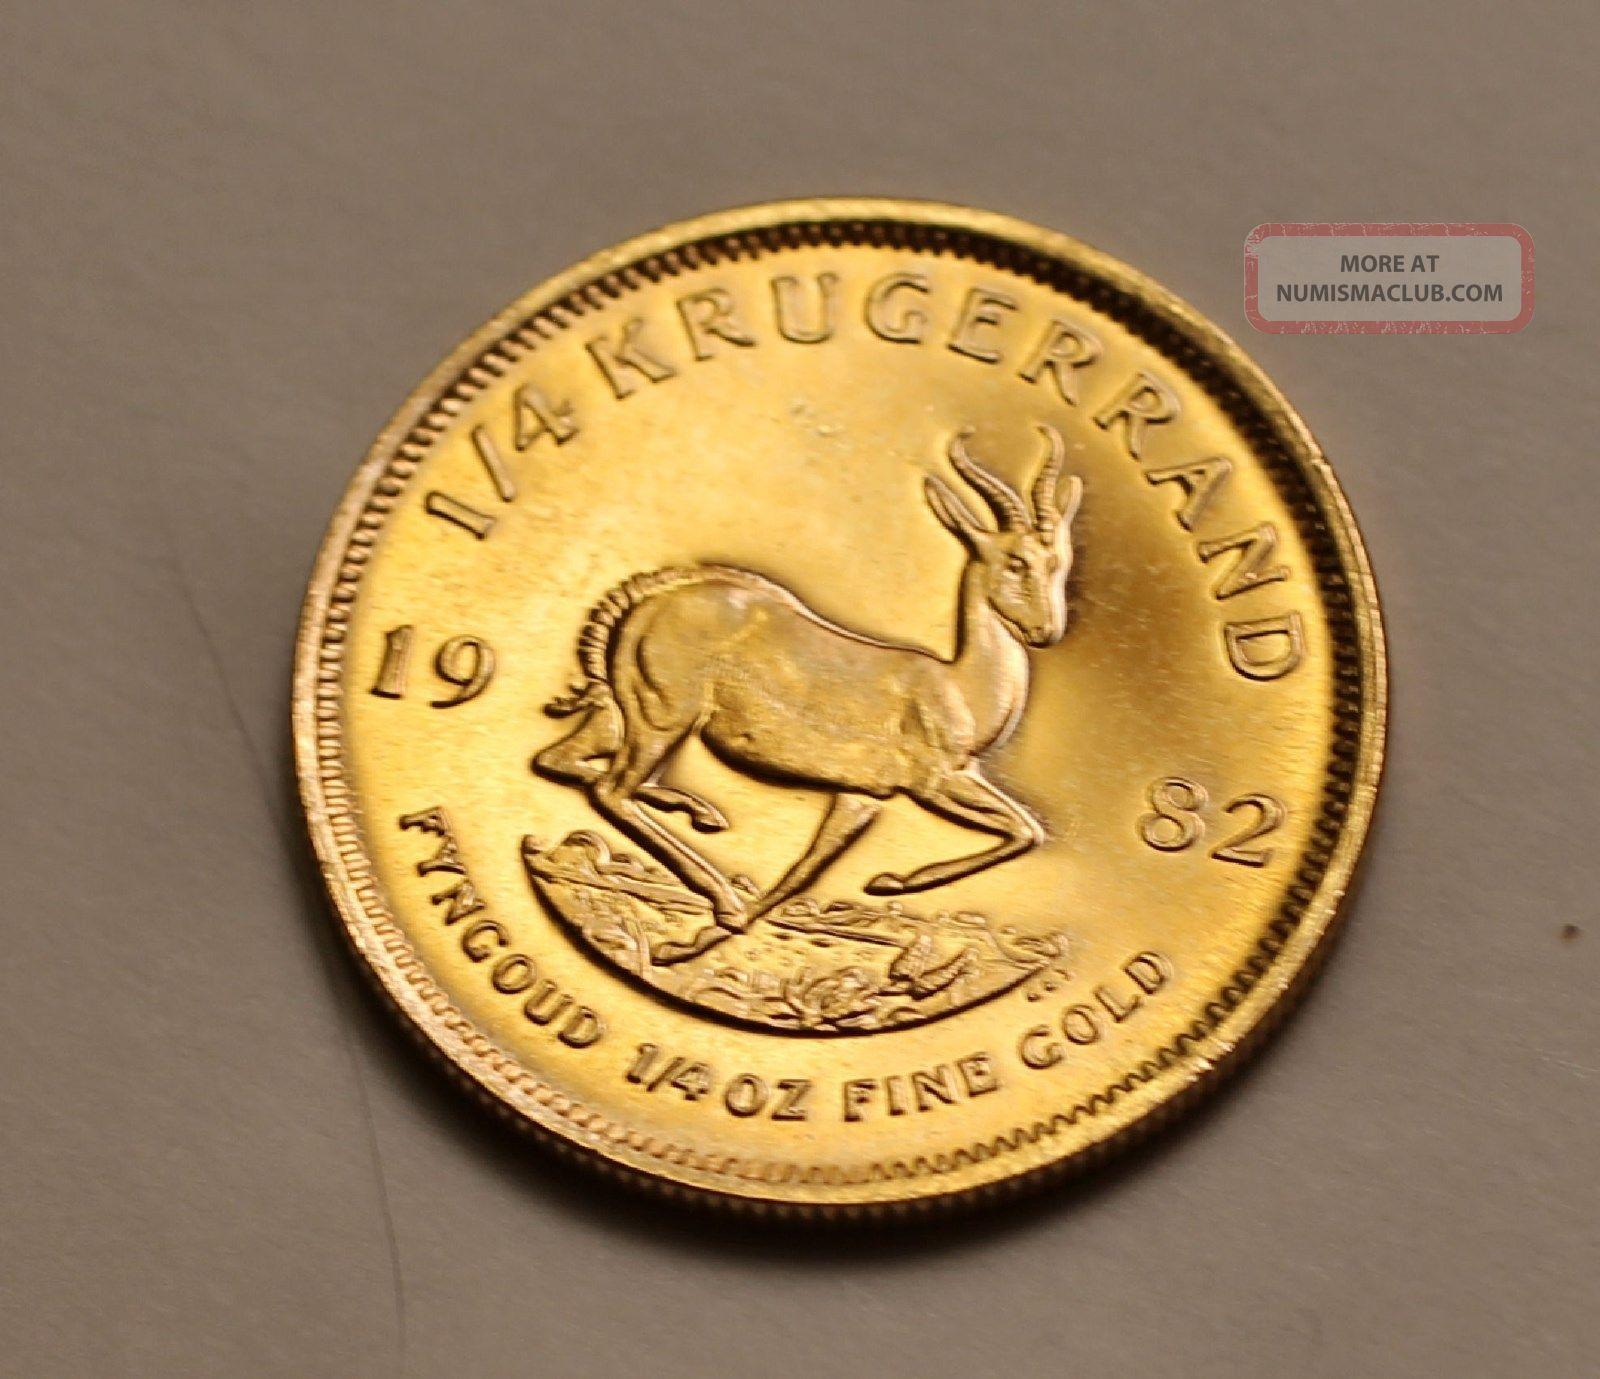 1982,  ¼ Oz South Africa Krugerrand,  Fine Gold Bullion Coin Gold photo